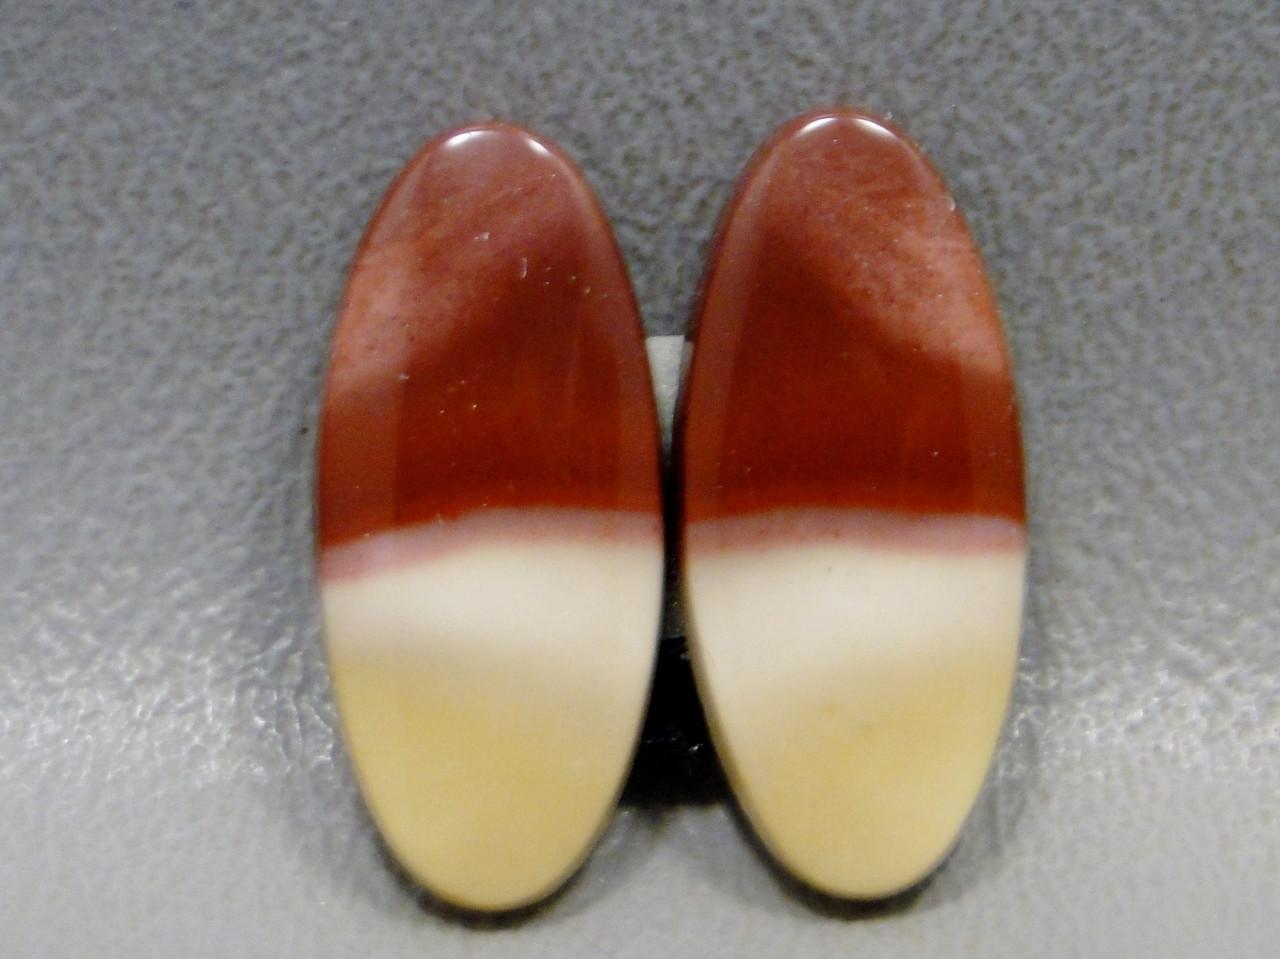 Mookaite Jasper Cabochons Matched Pairs Gemstones #19